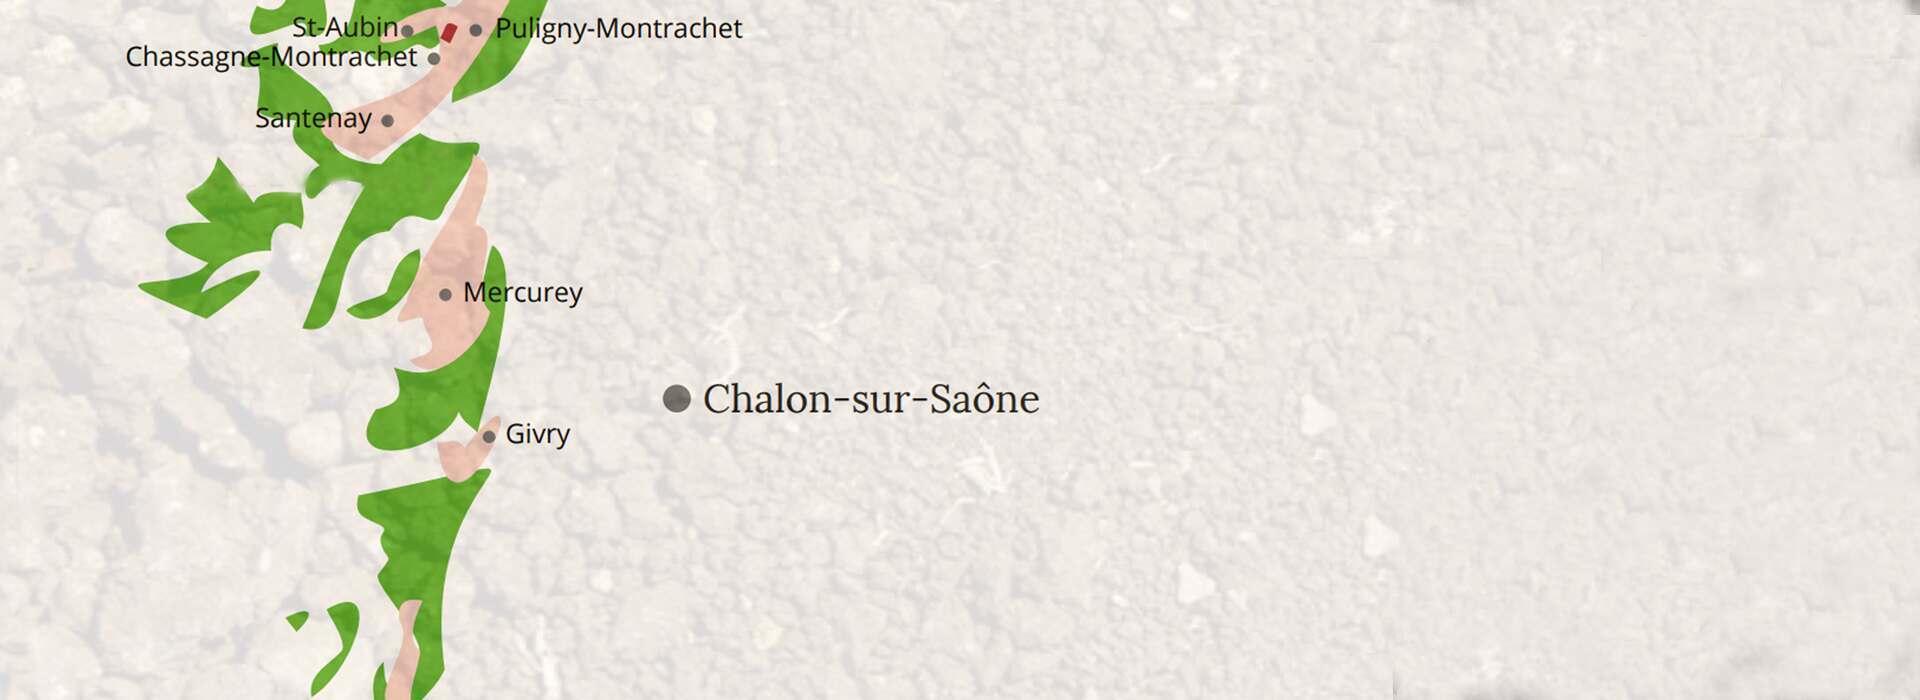 Côte Chalonnaise wine